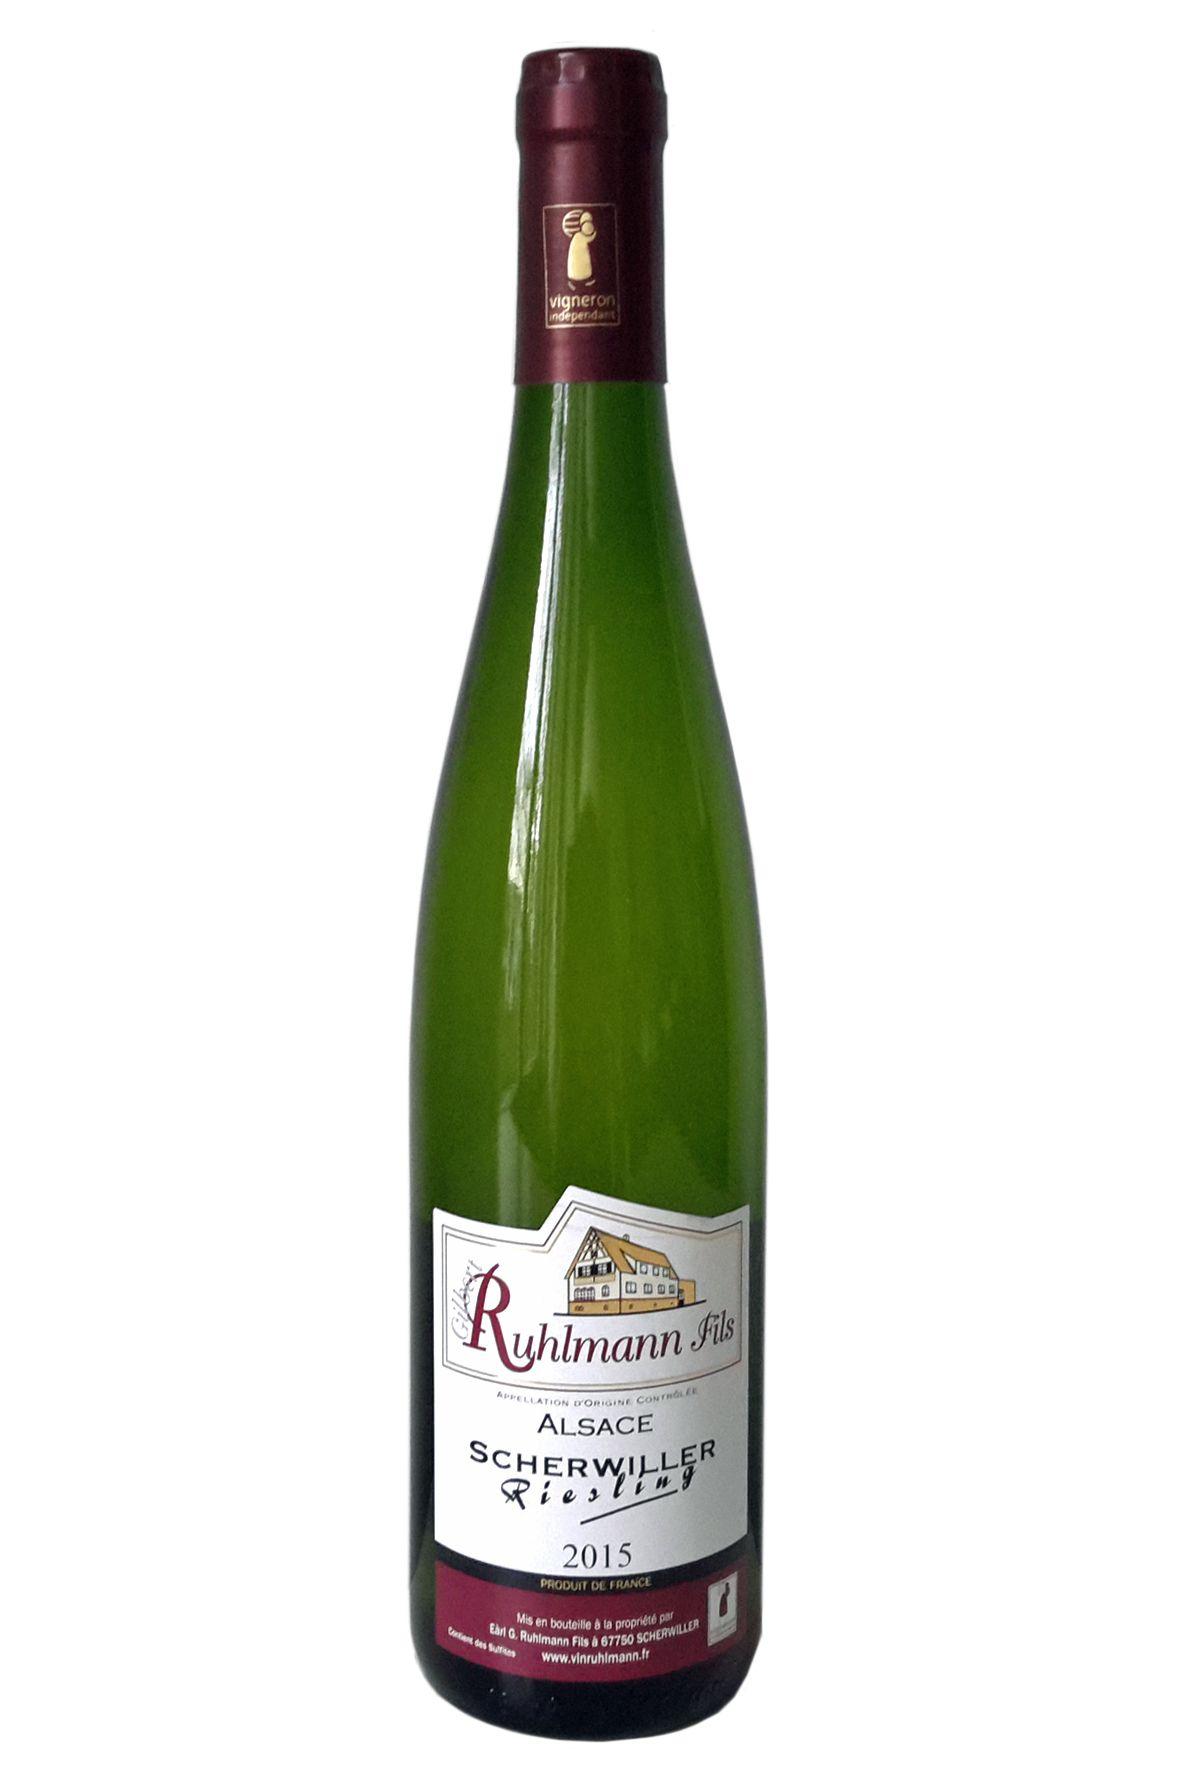 Gilbert Ruhlmann Scherwiller Riesling Frankrijk Alsace Elzas witte wijn